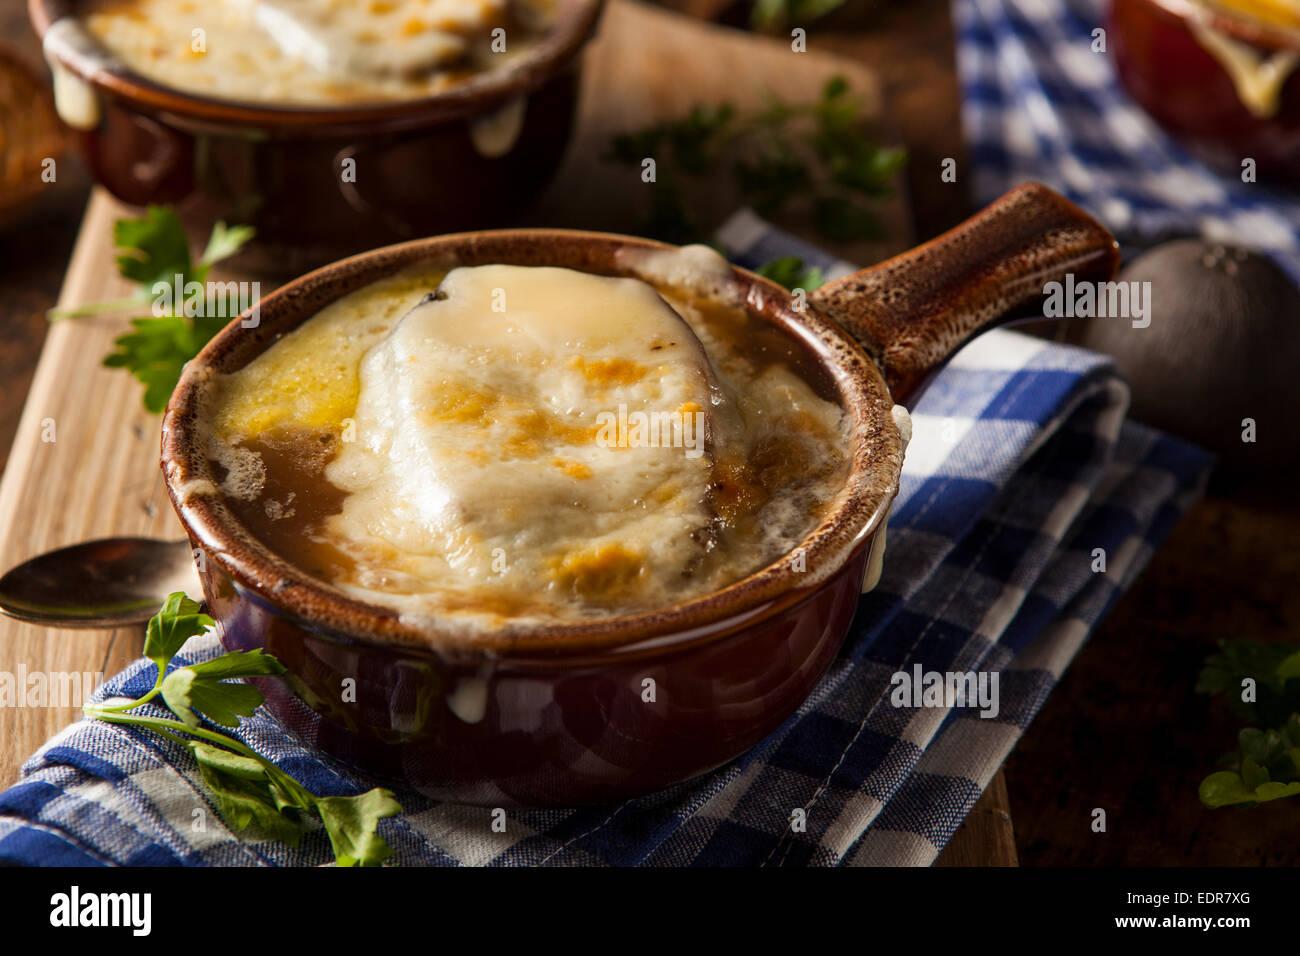 Toast photos toast images alamy - Soupe a oignon maison ...